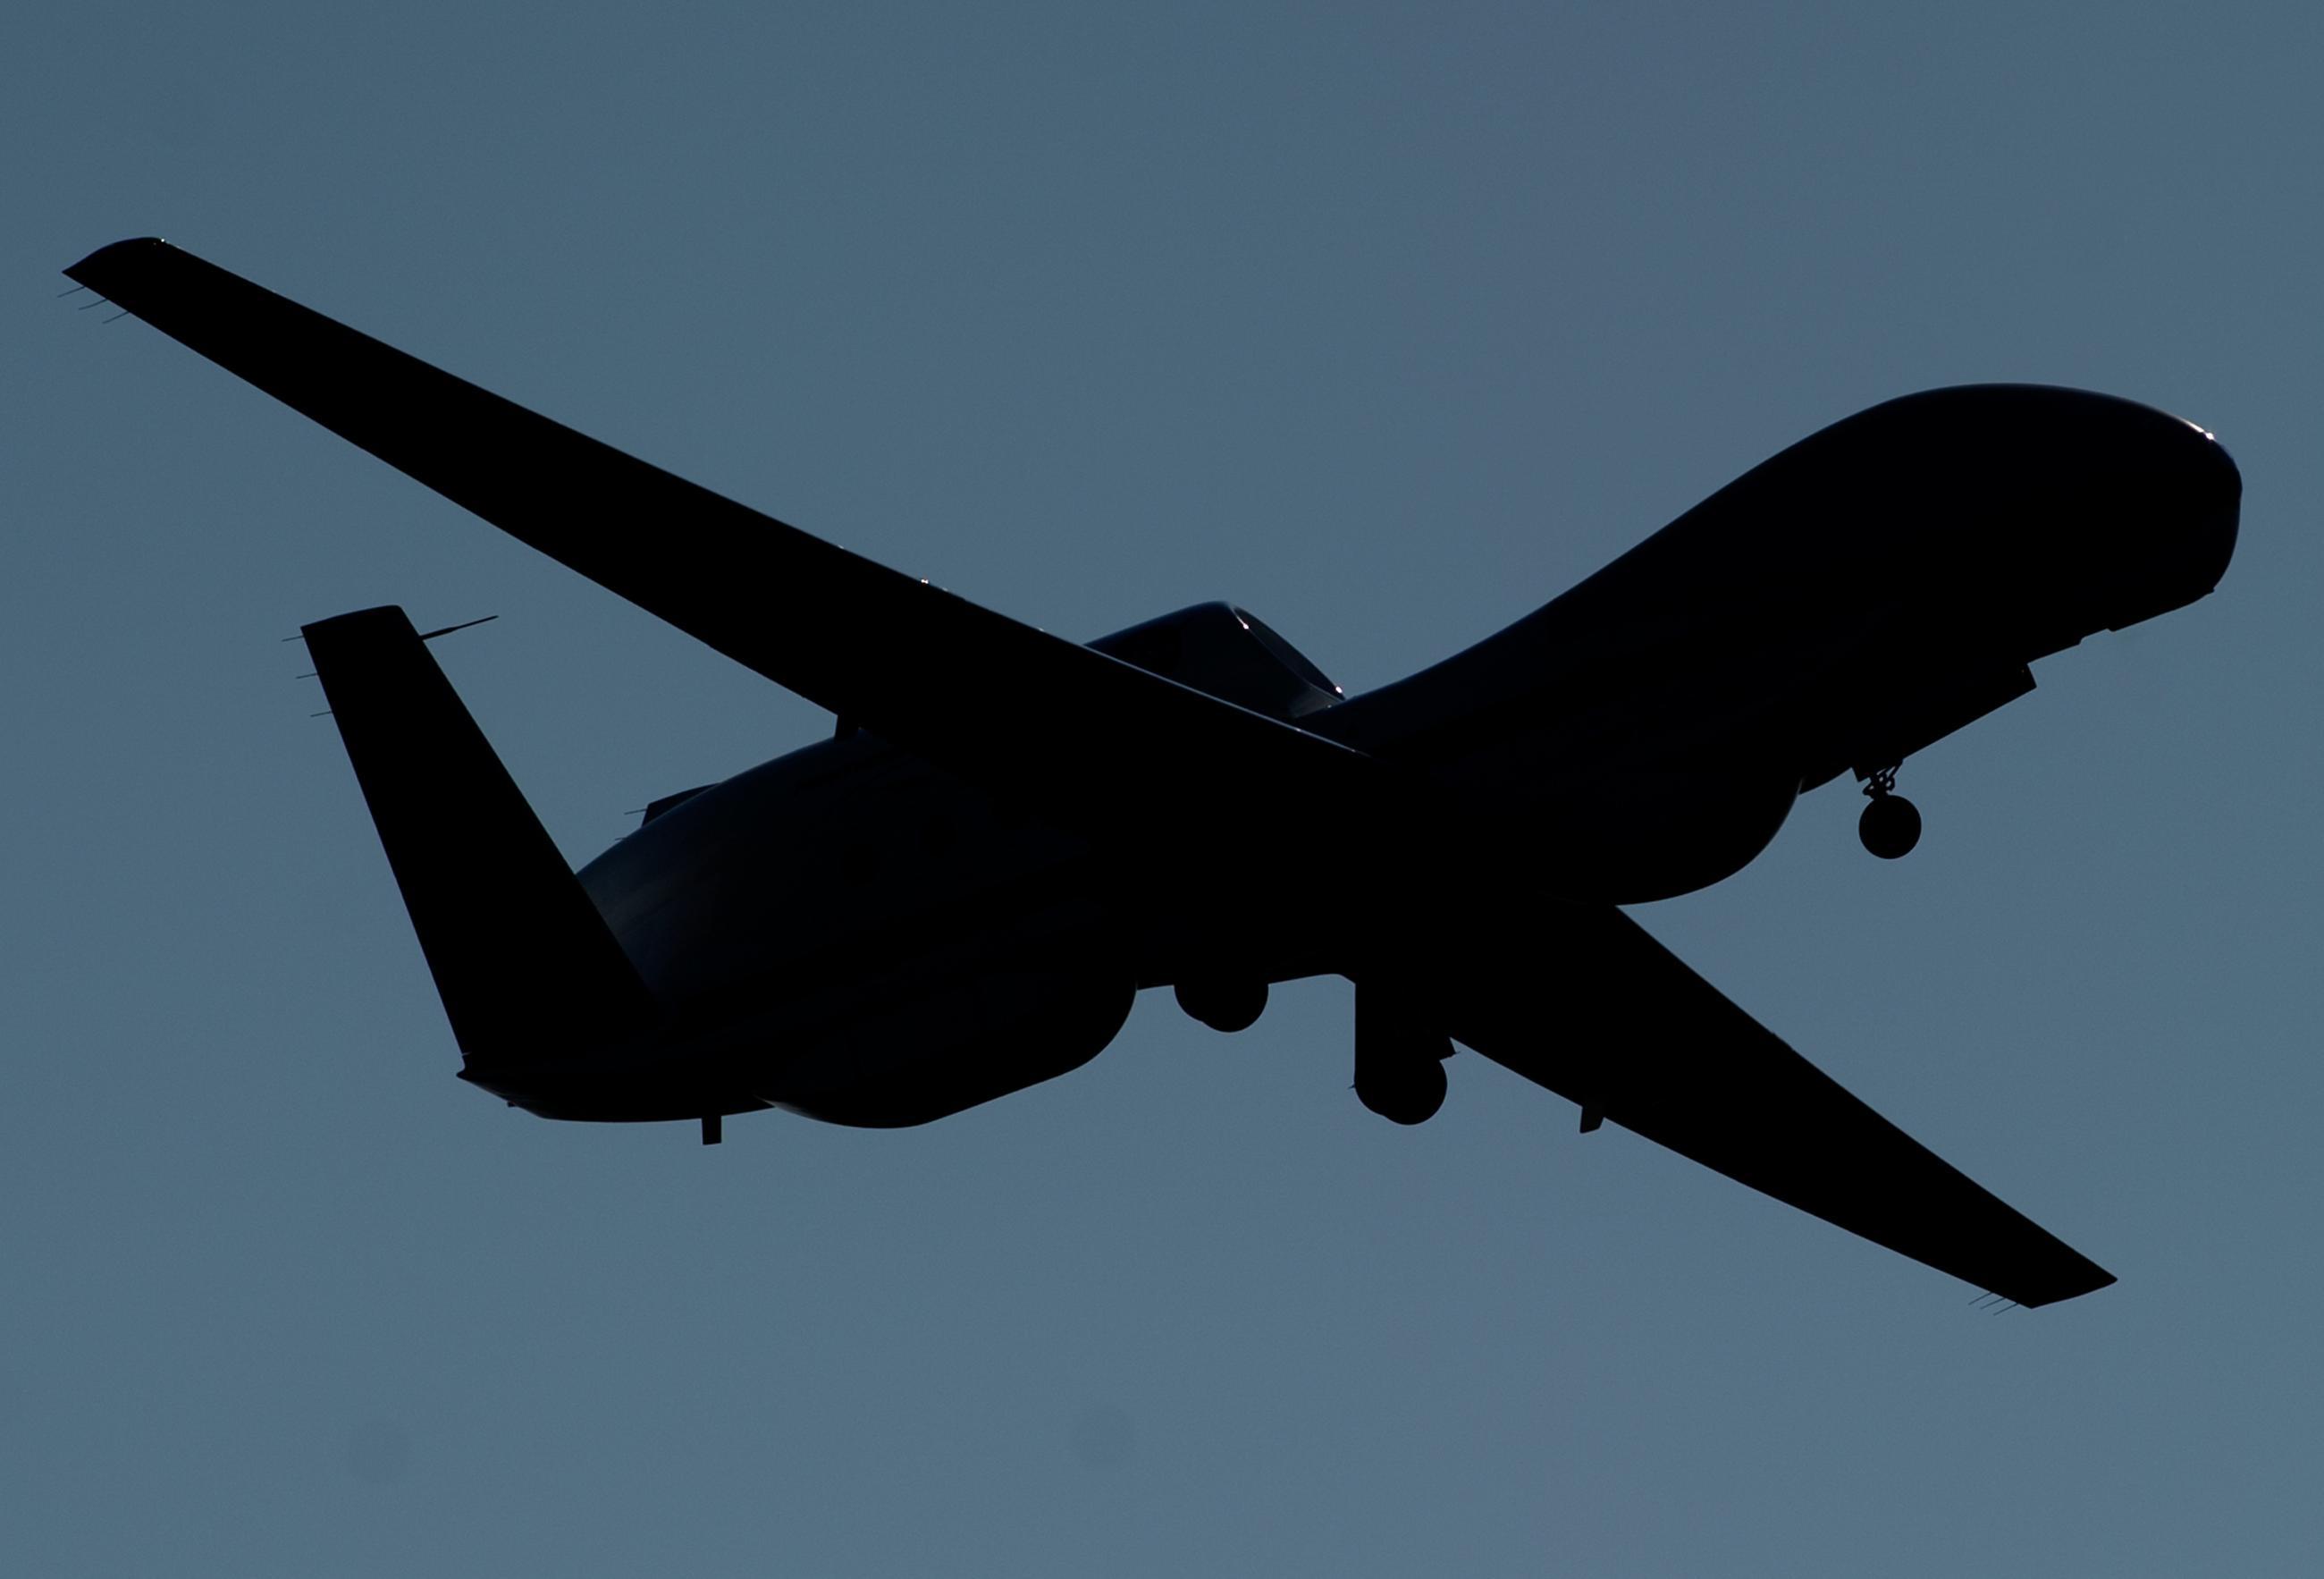 Obama Administration Considering Drone Strike on U.S. Citizen